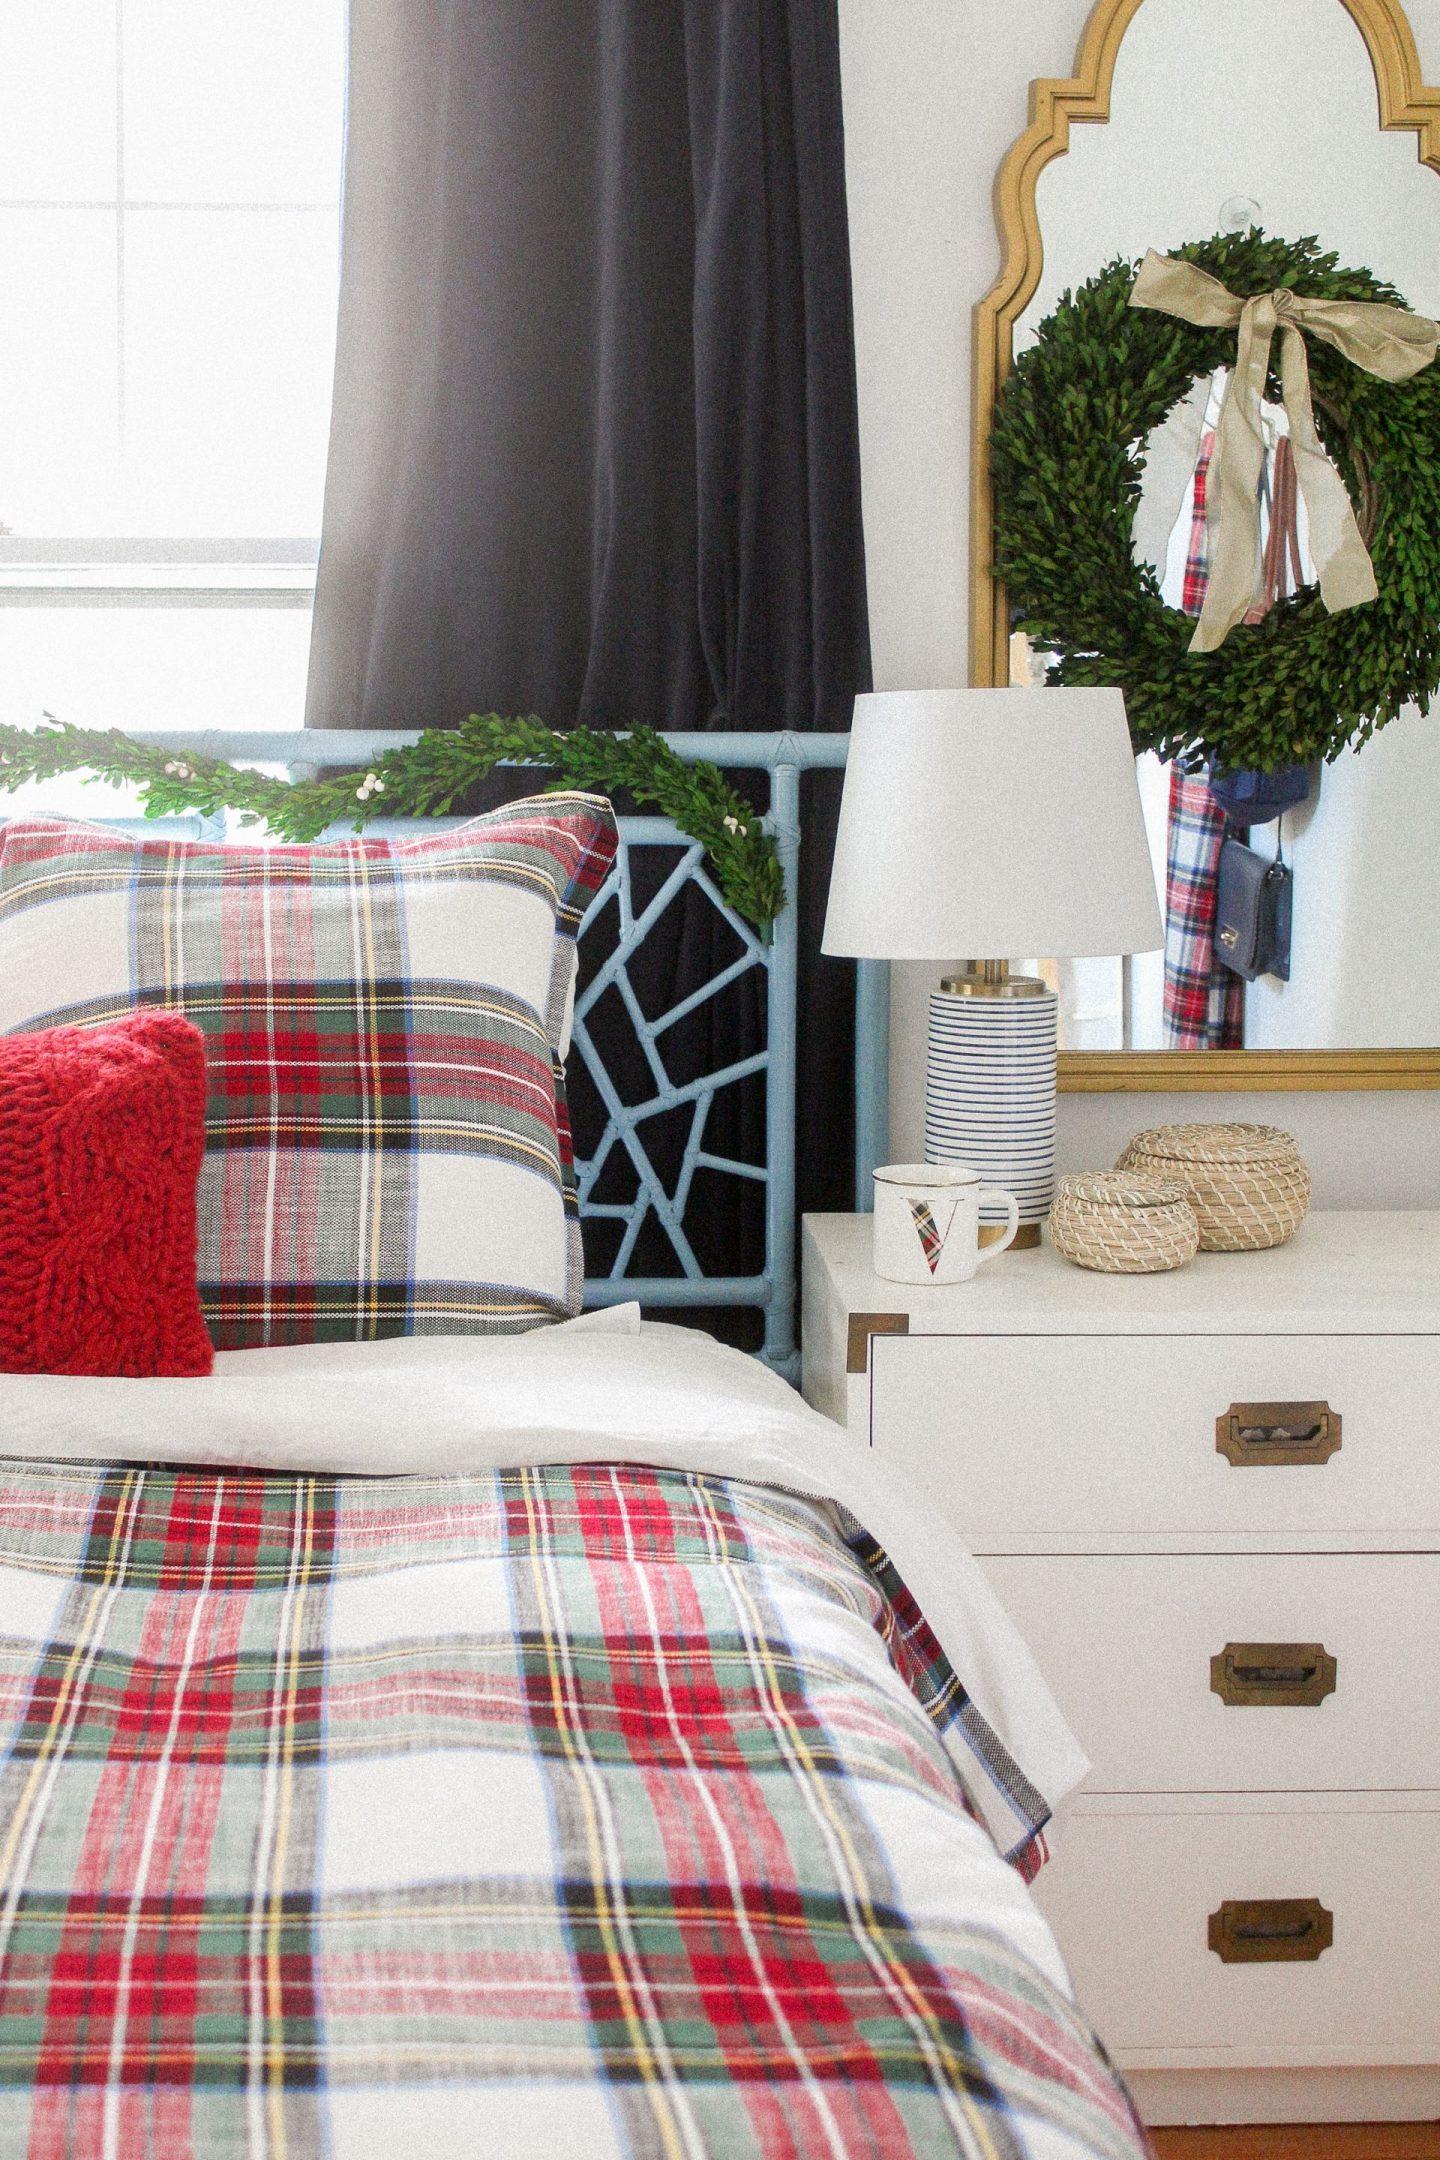 Tartan Tidings and Festive Bedding